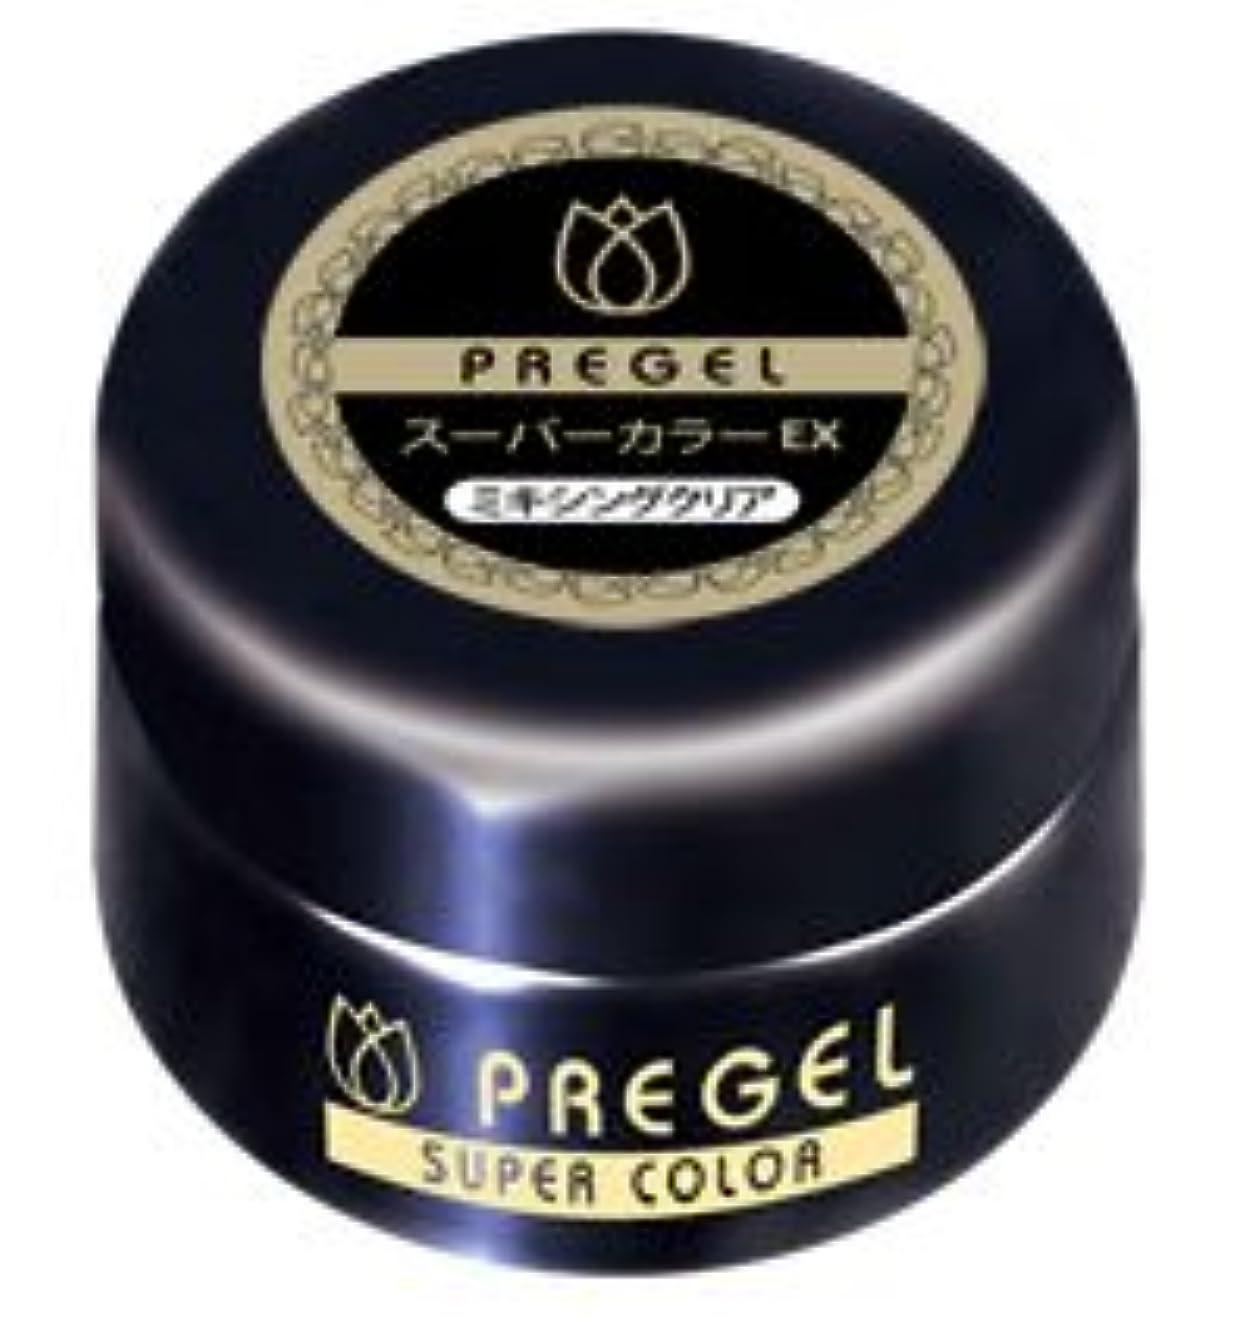 PREGEL(プリジェル) スーパーカラーEx PG-SE000 <BR>ミキシングクリア 4g